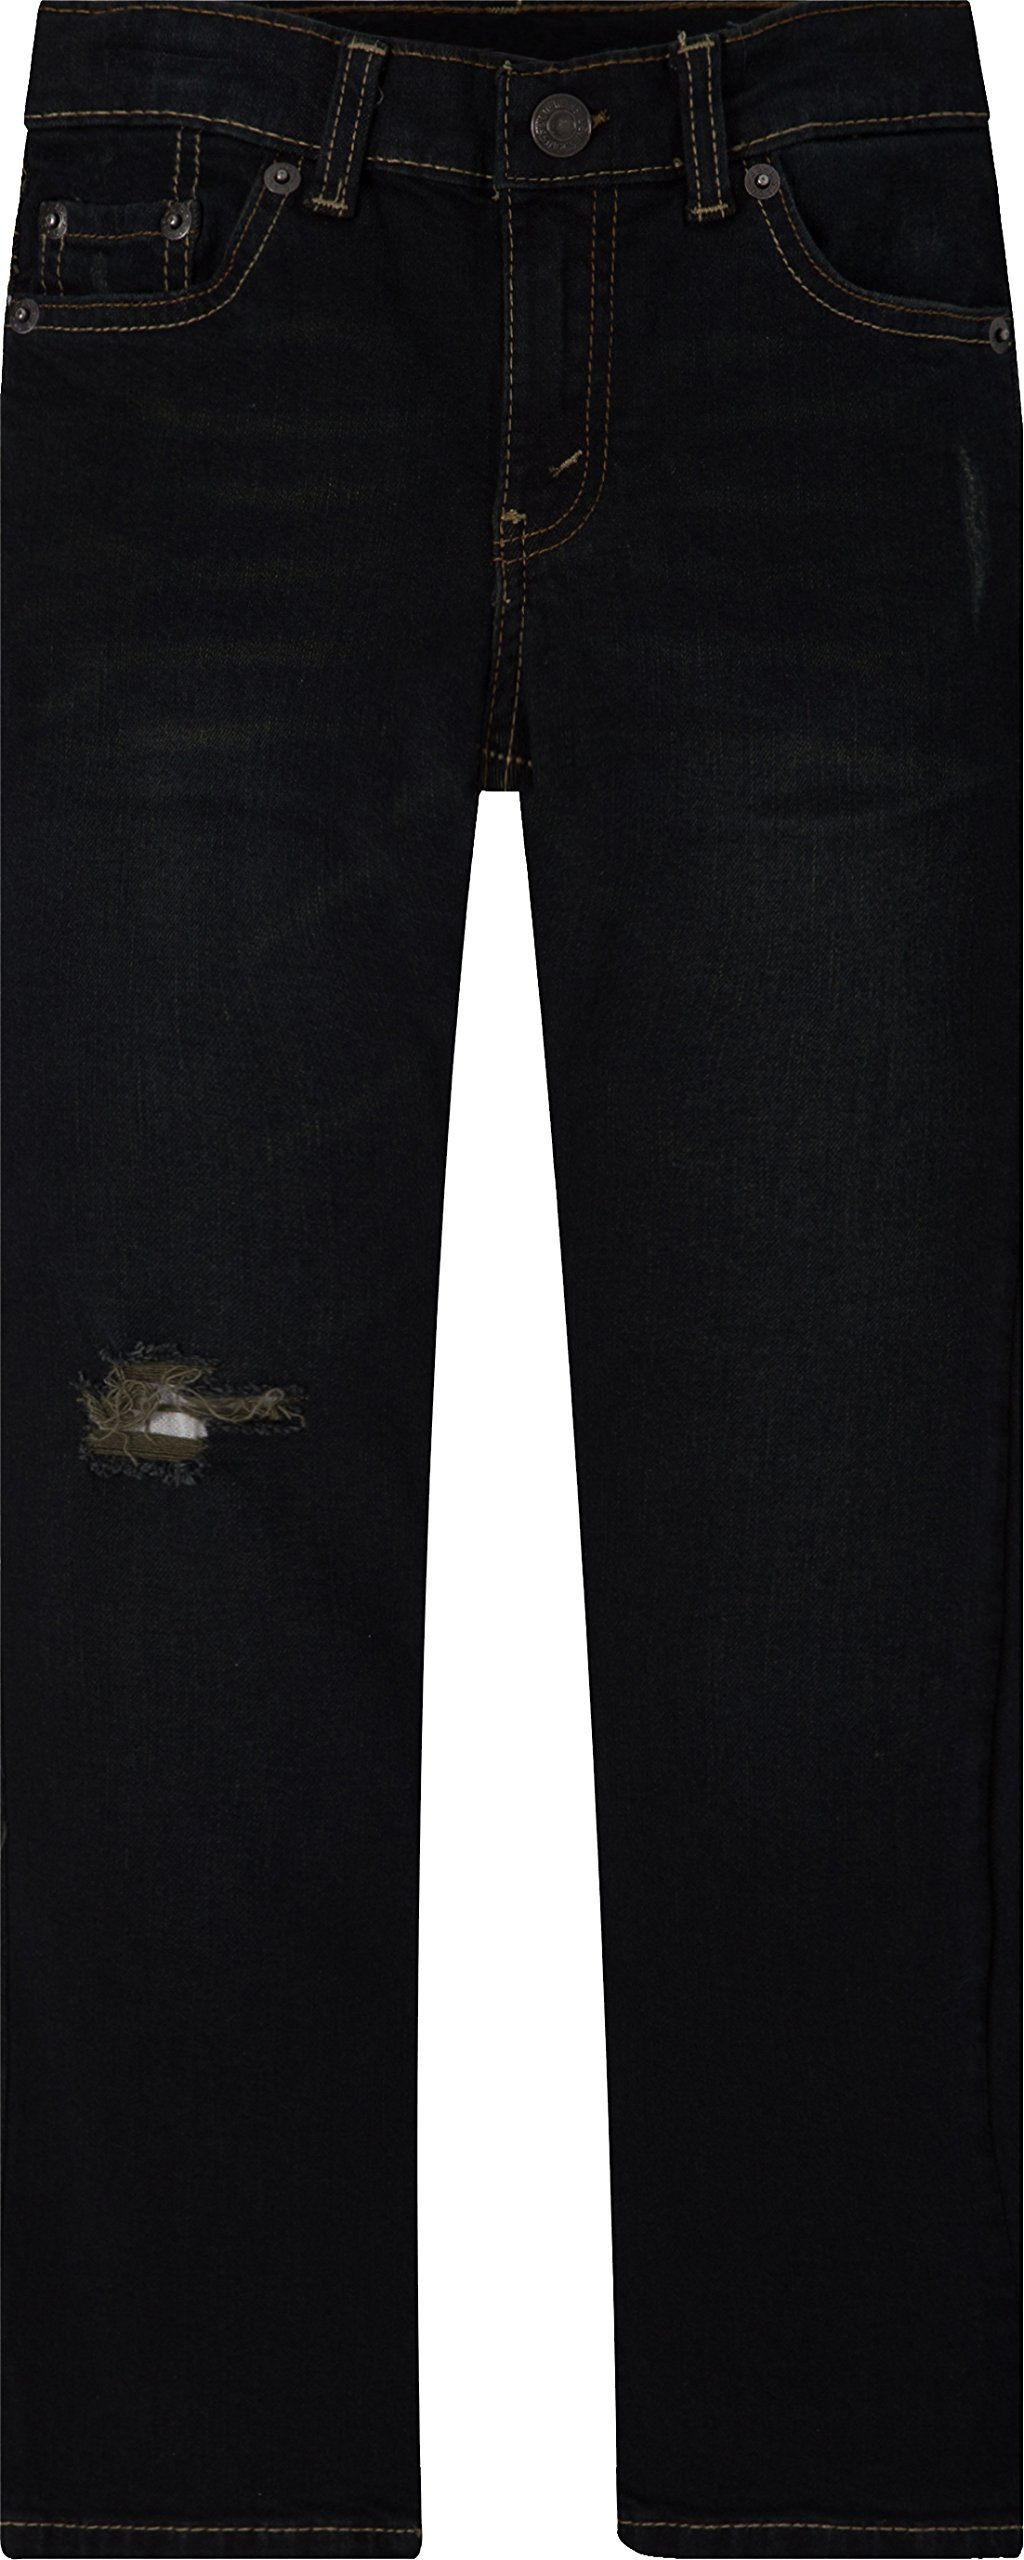 24ad41ff Galleon - Levi's Boys' Big 511 Slim Fit Distressed Jeans, Dirt Road 12